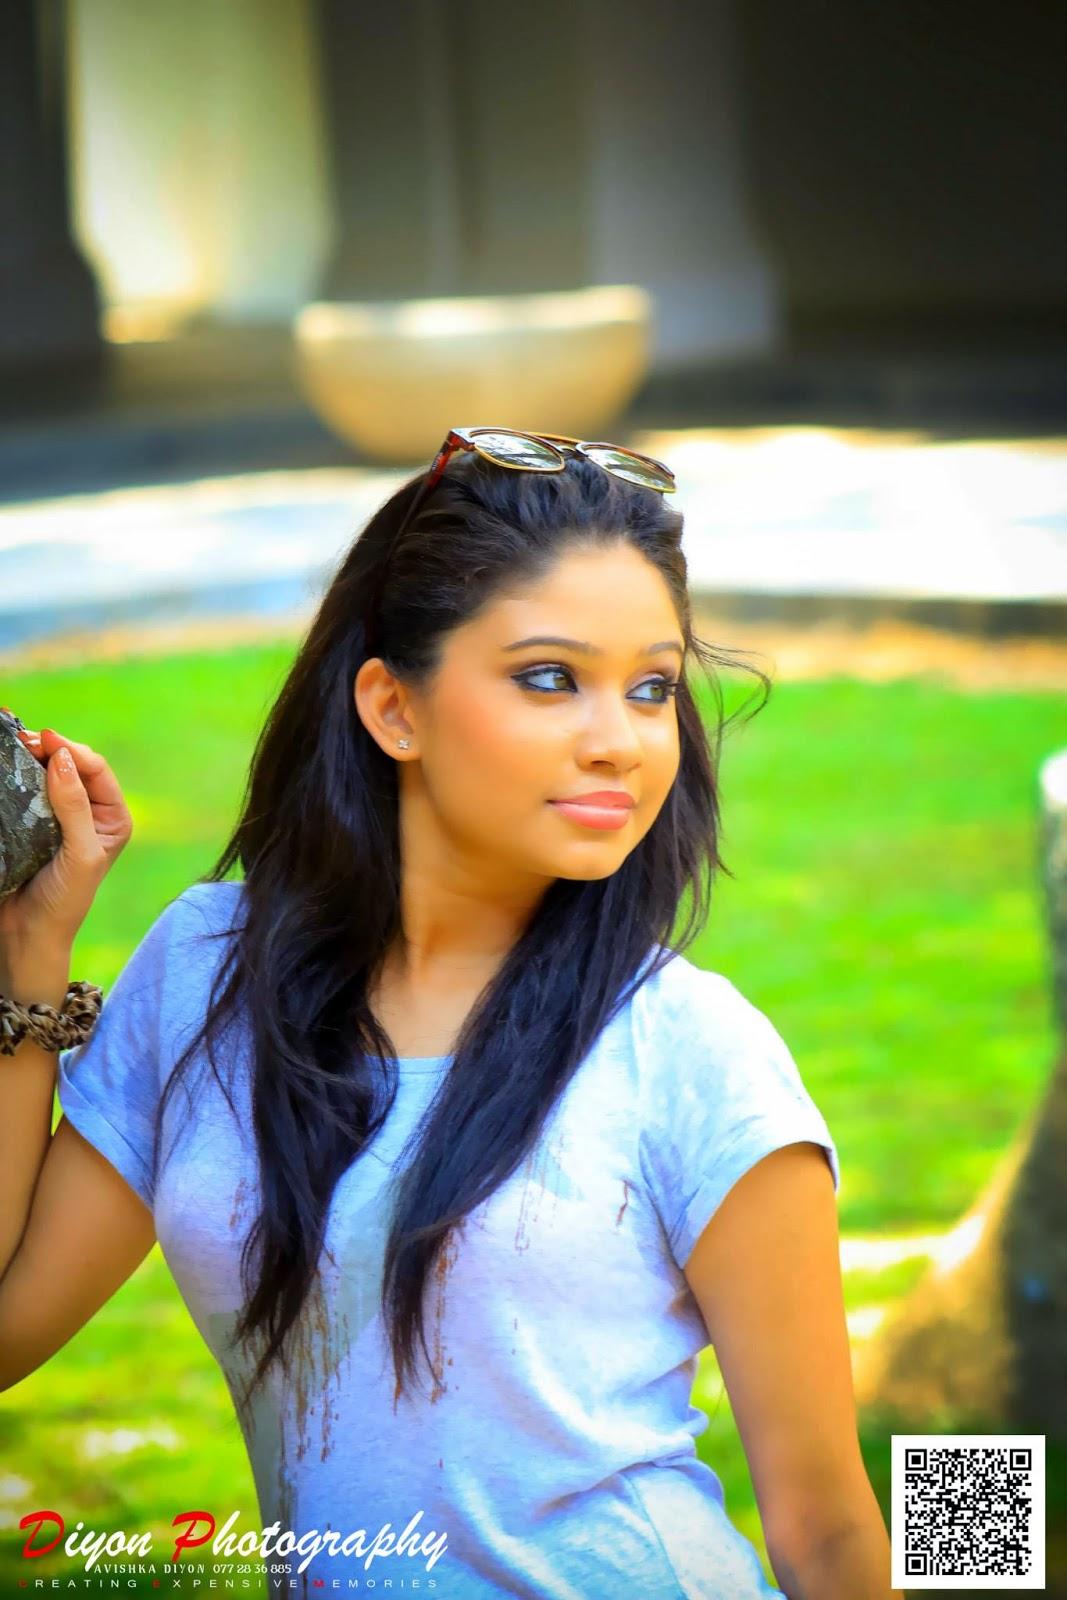 Shehani Kahandawala Works at TV Derana